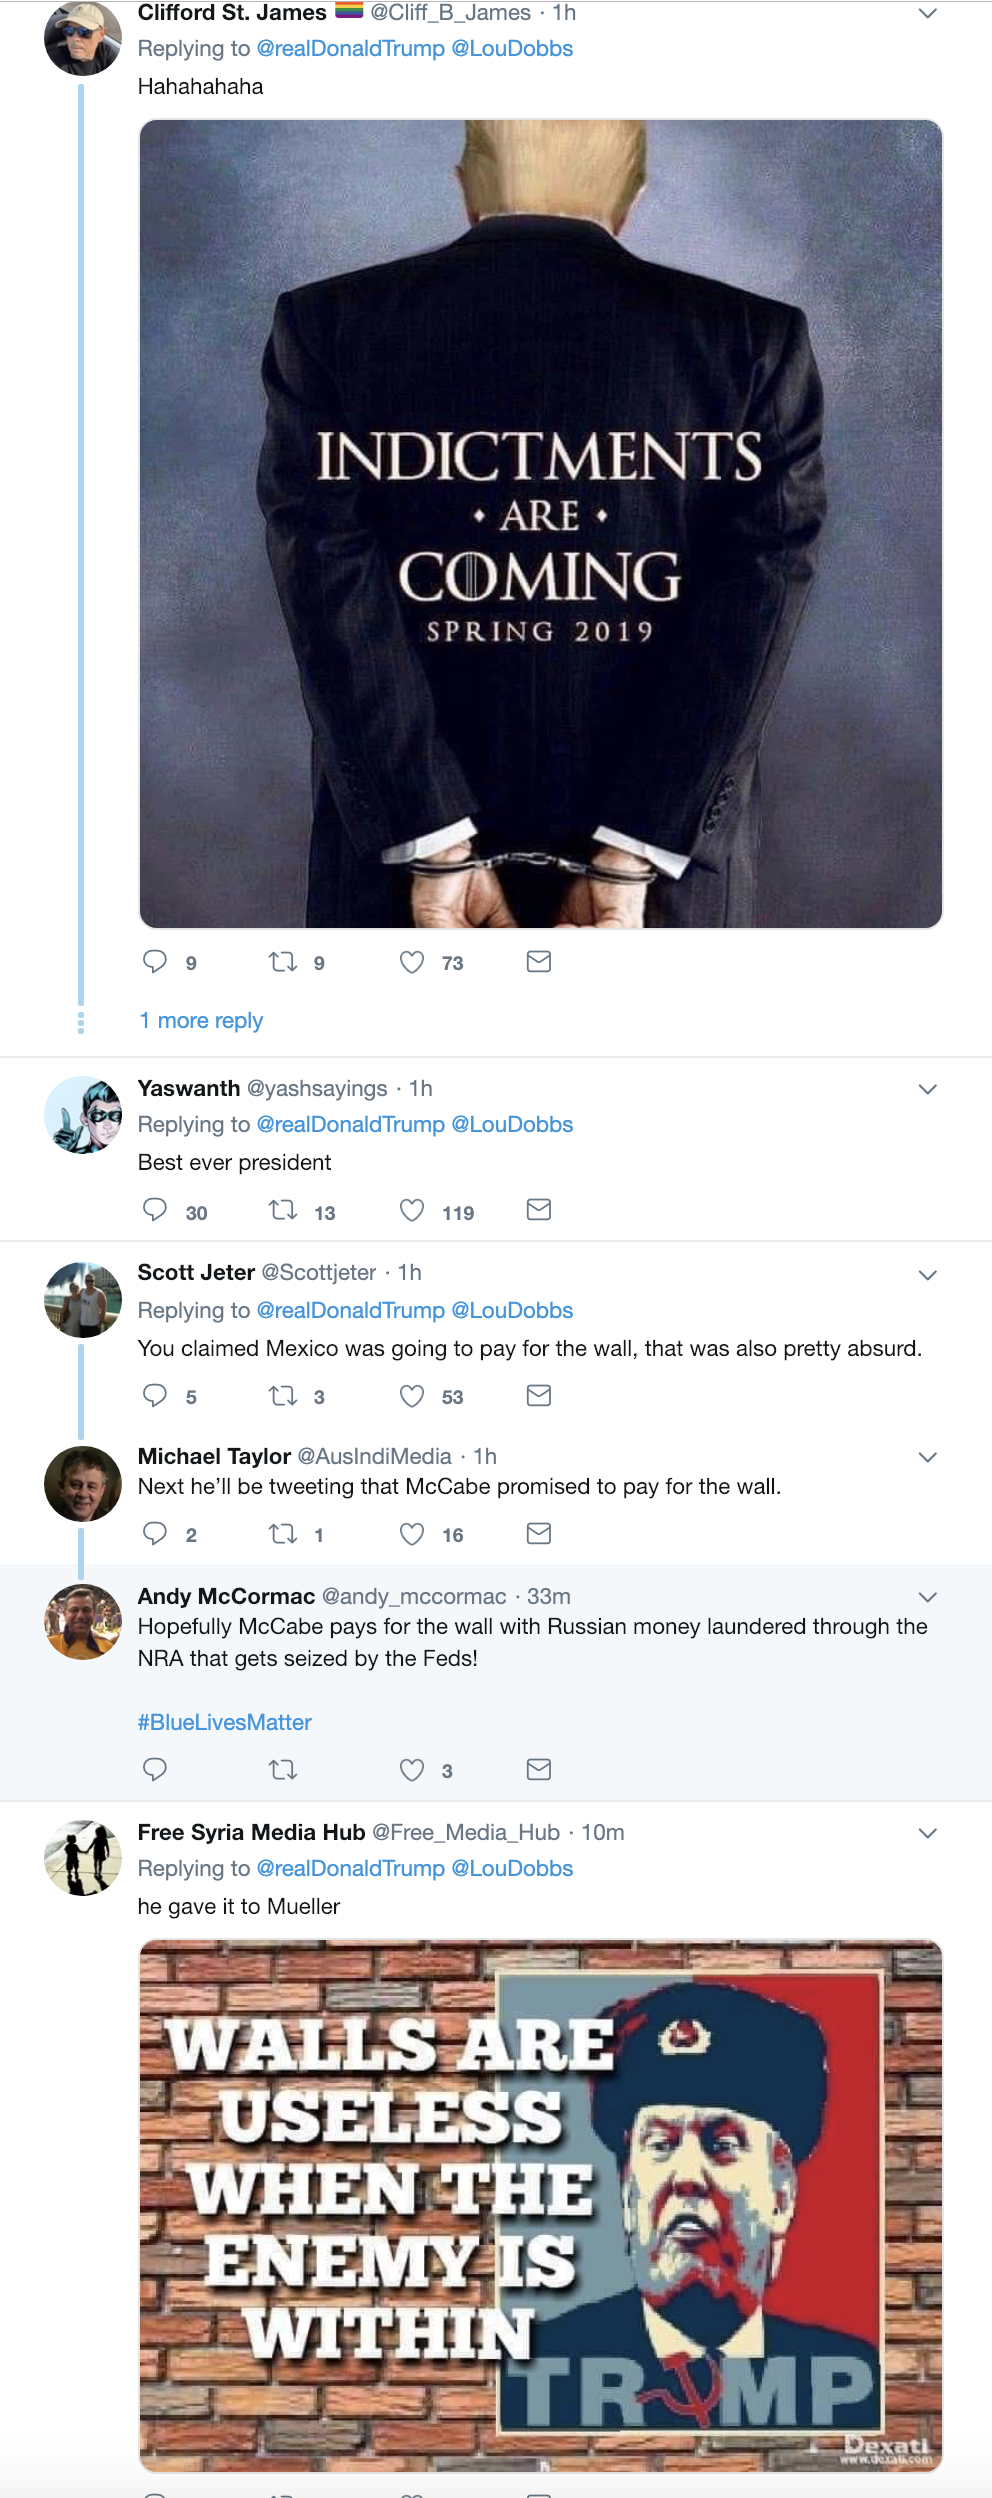 Screen-Shot-2019-02-20-at-7.11.48-AM Trump Wakes In A Tizzy, Unleashes 5-Tweet Ramble Like A Mental Patient Corruption Crime Donald Trump James Comey Mueller Politics Robert Mueller Russia Top Stories